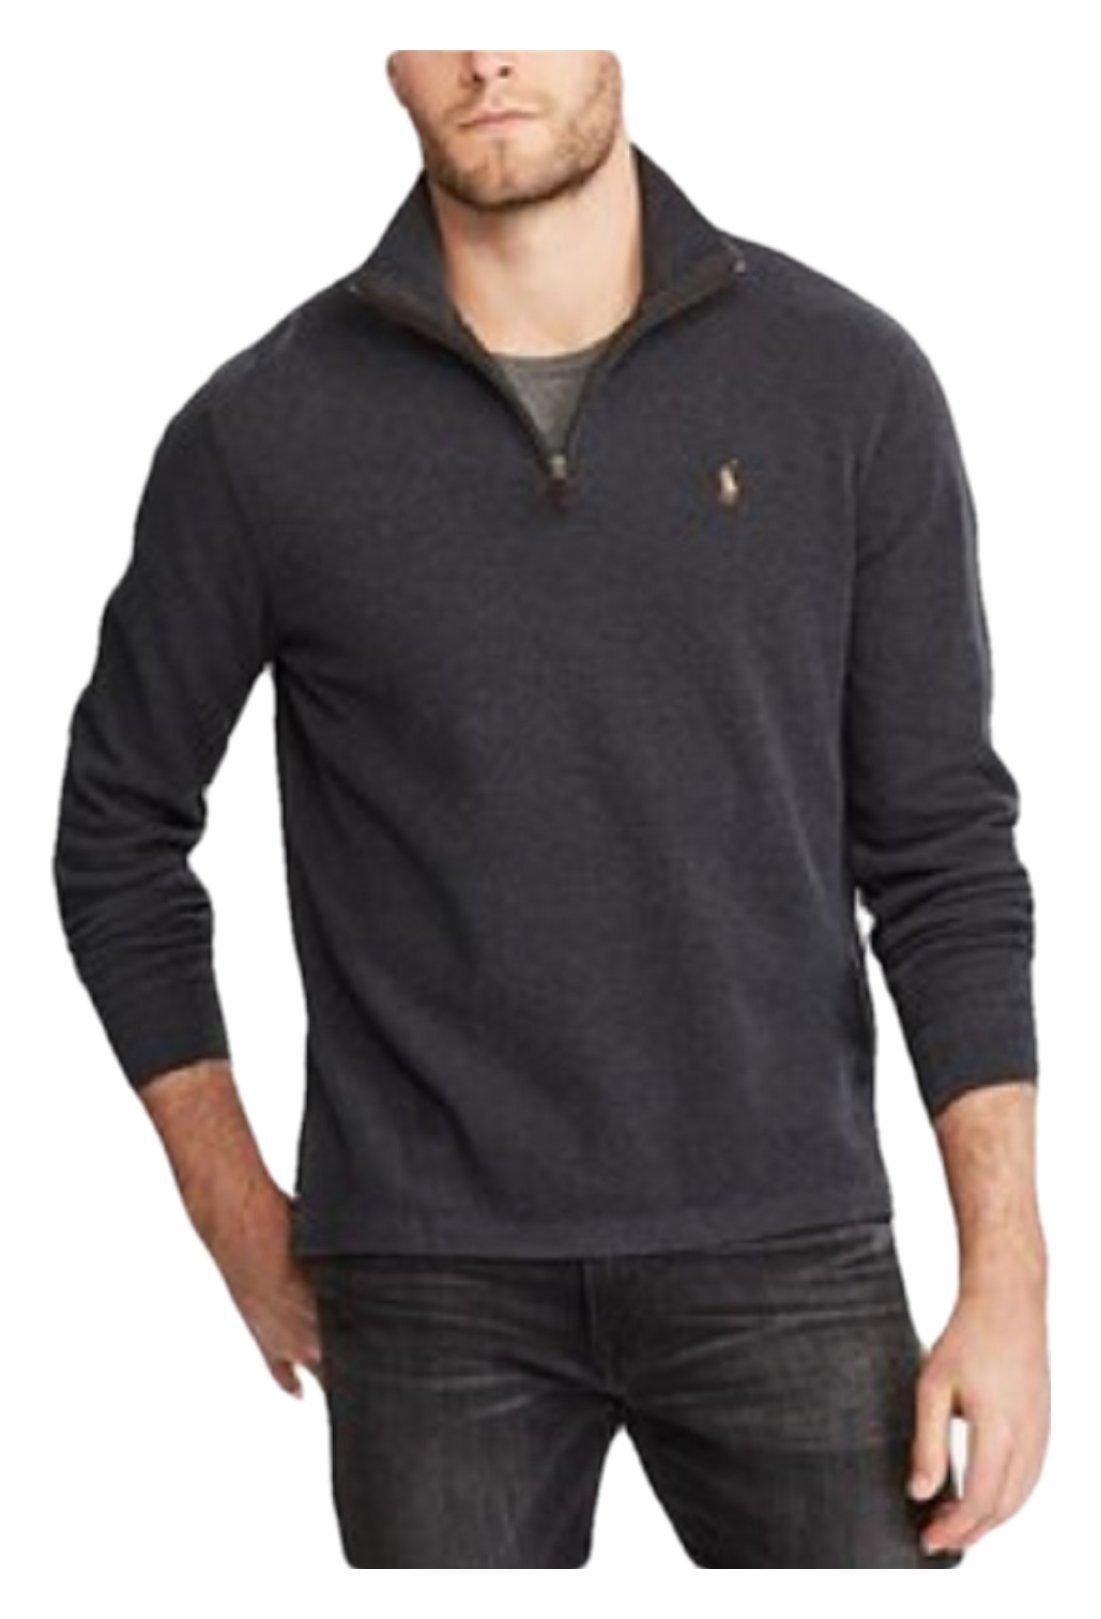 RALPH LAUREN Polo Men's Estate-Rib Cotton Mock Neck Half Zip Pullover Sweater (Dark Granite, XX-Large)